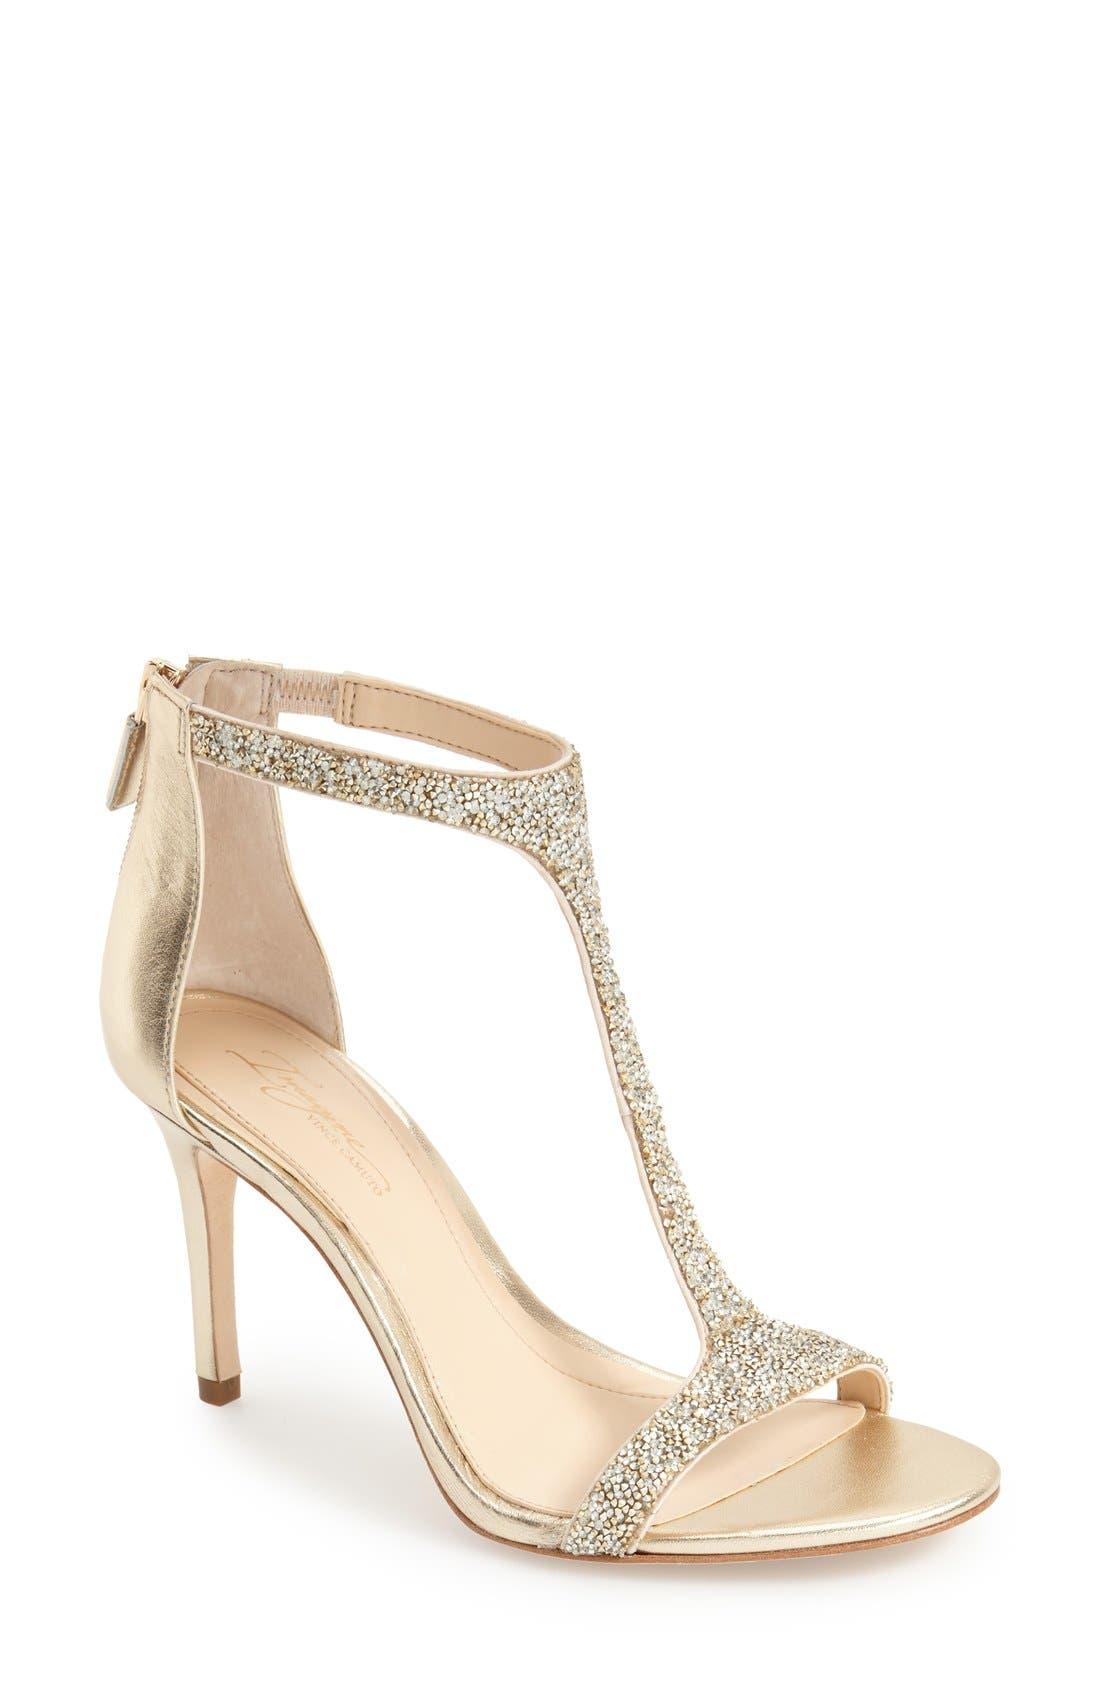 'Phoebe' Embellished T-Strap Sandal,                             Main thumbnail 1, color,                             Crystal/Gold Nappa